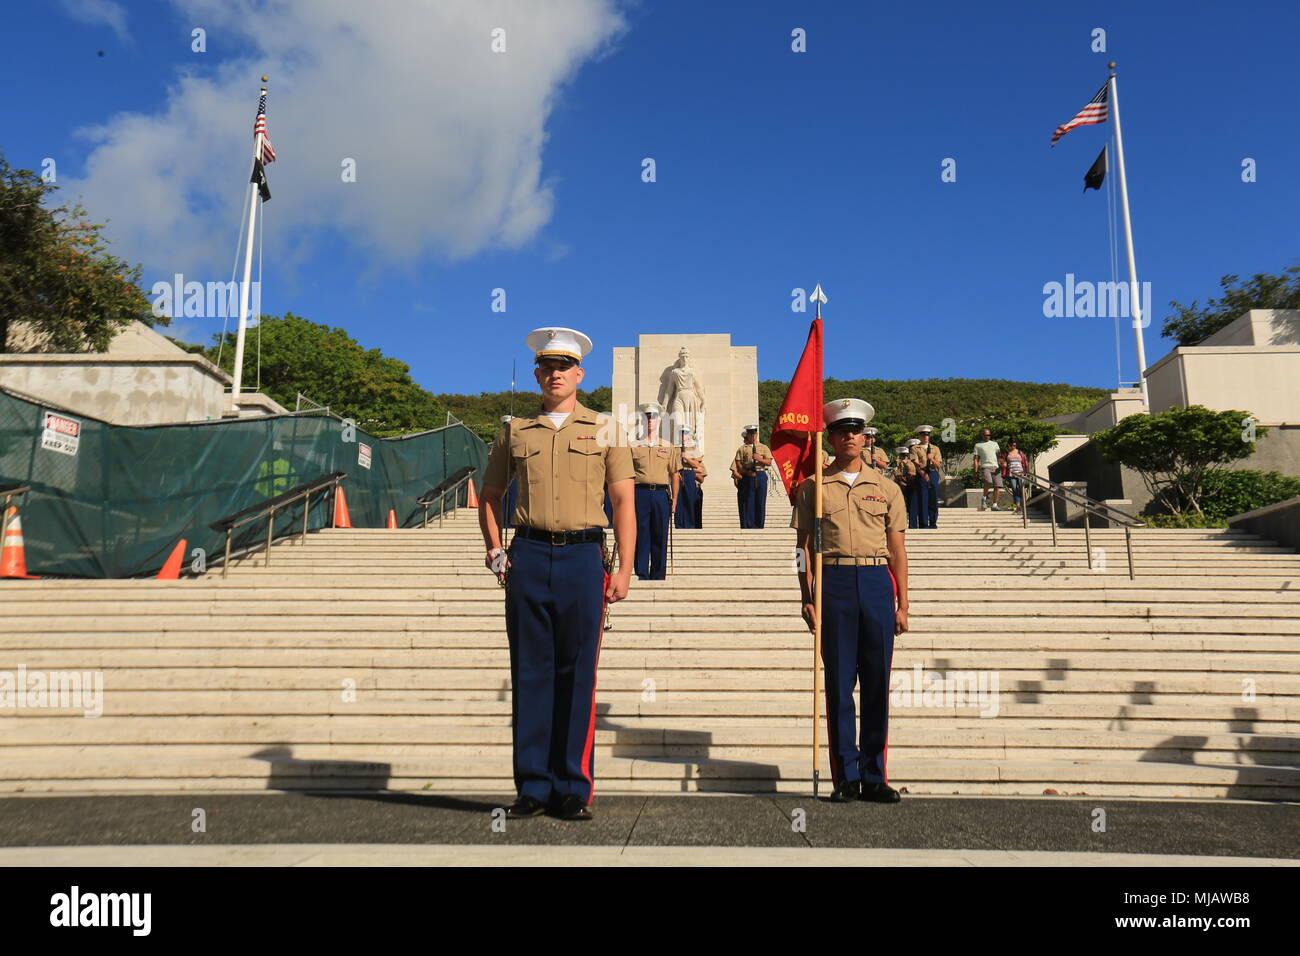 U s marine corps st lt travis valdovinos the commander of